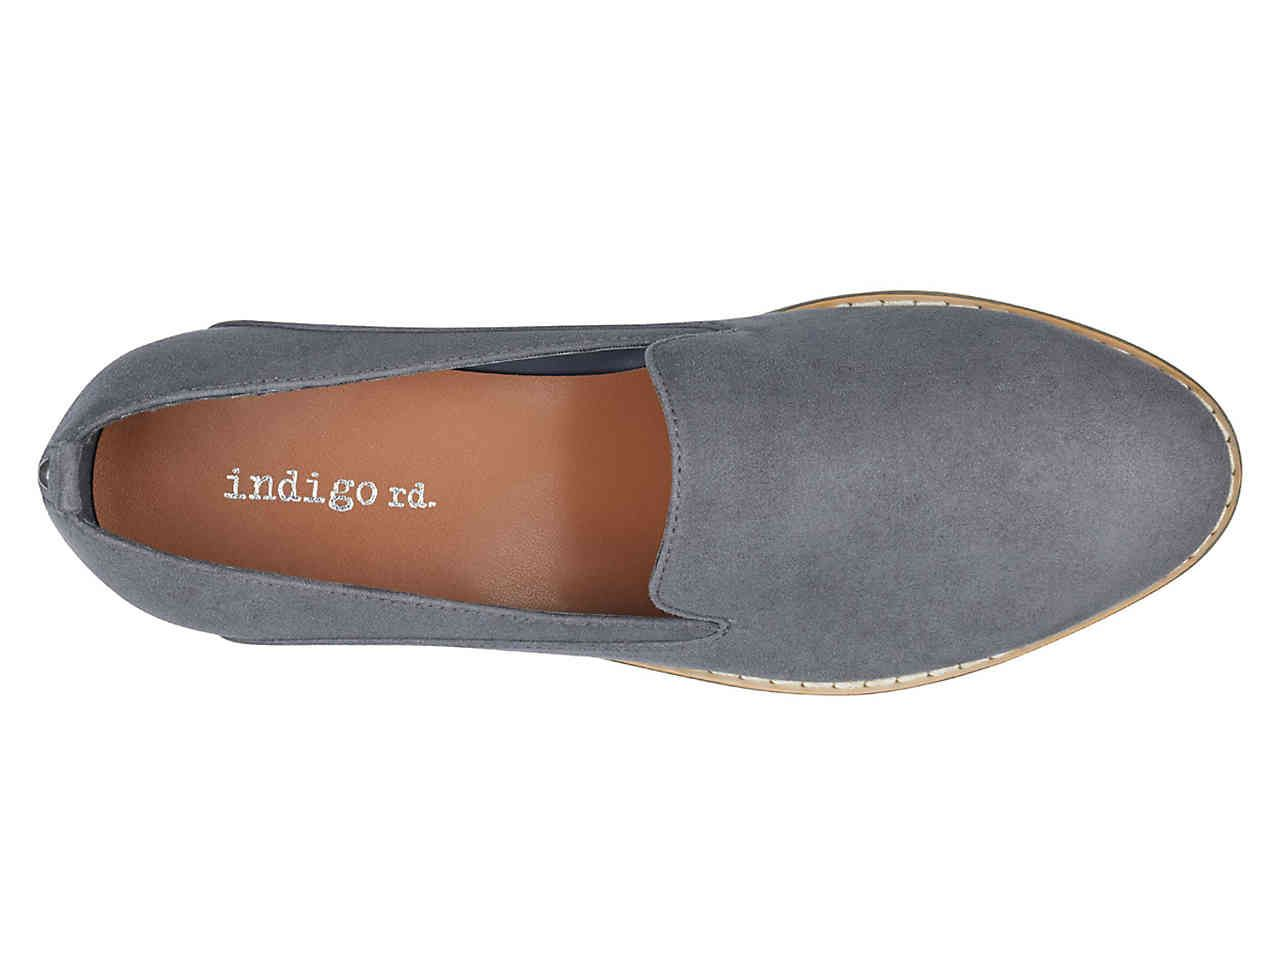 ce49c9fc3fe Indigo Rd. Hestley Loafer Women s Shoes